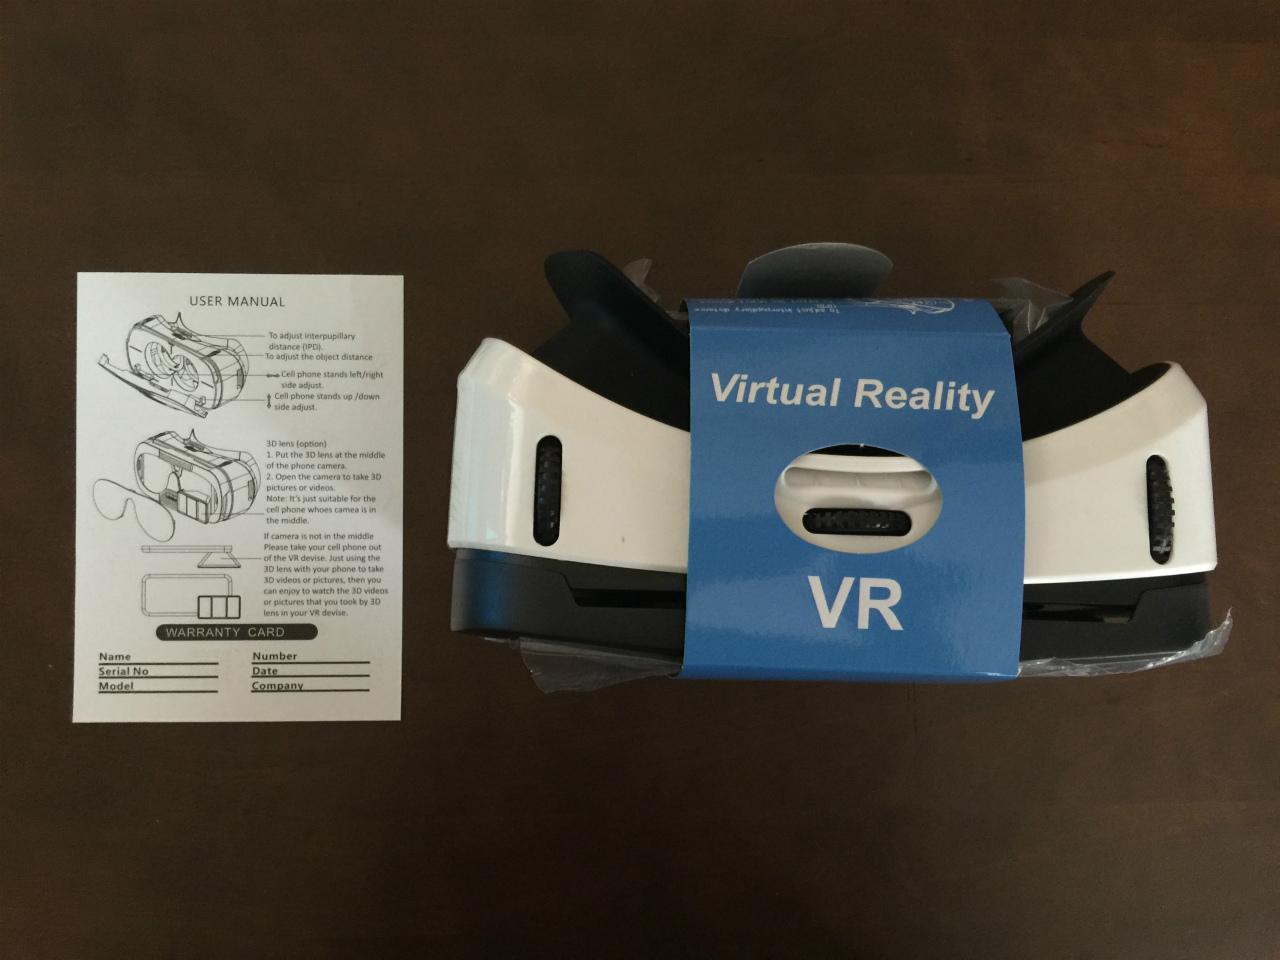 1213-201604_SoundSOUL 3D VR Glass G3 03